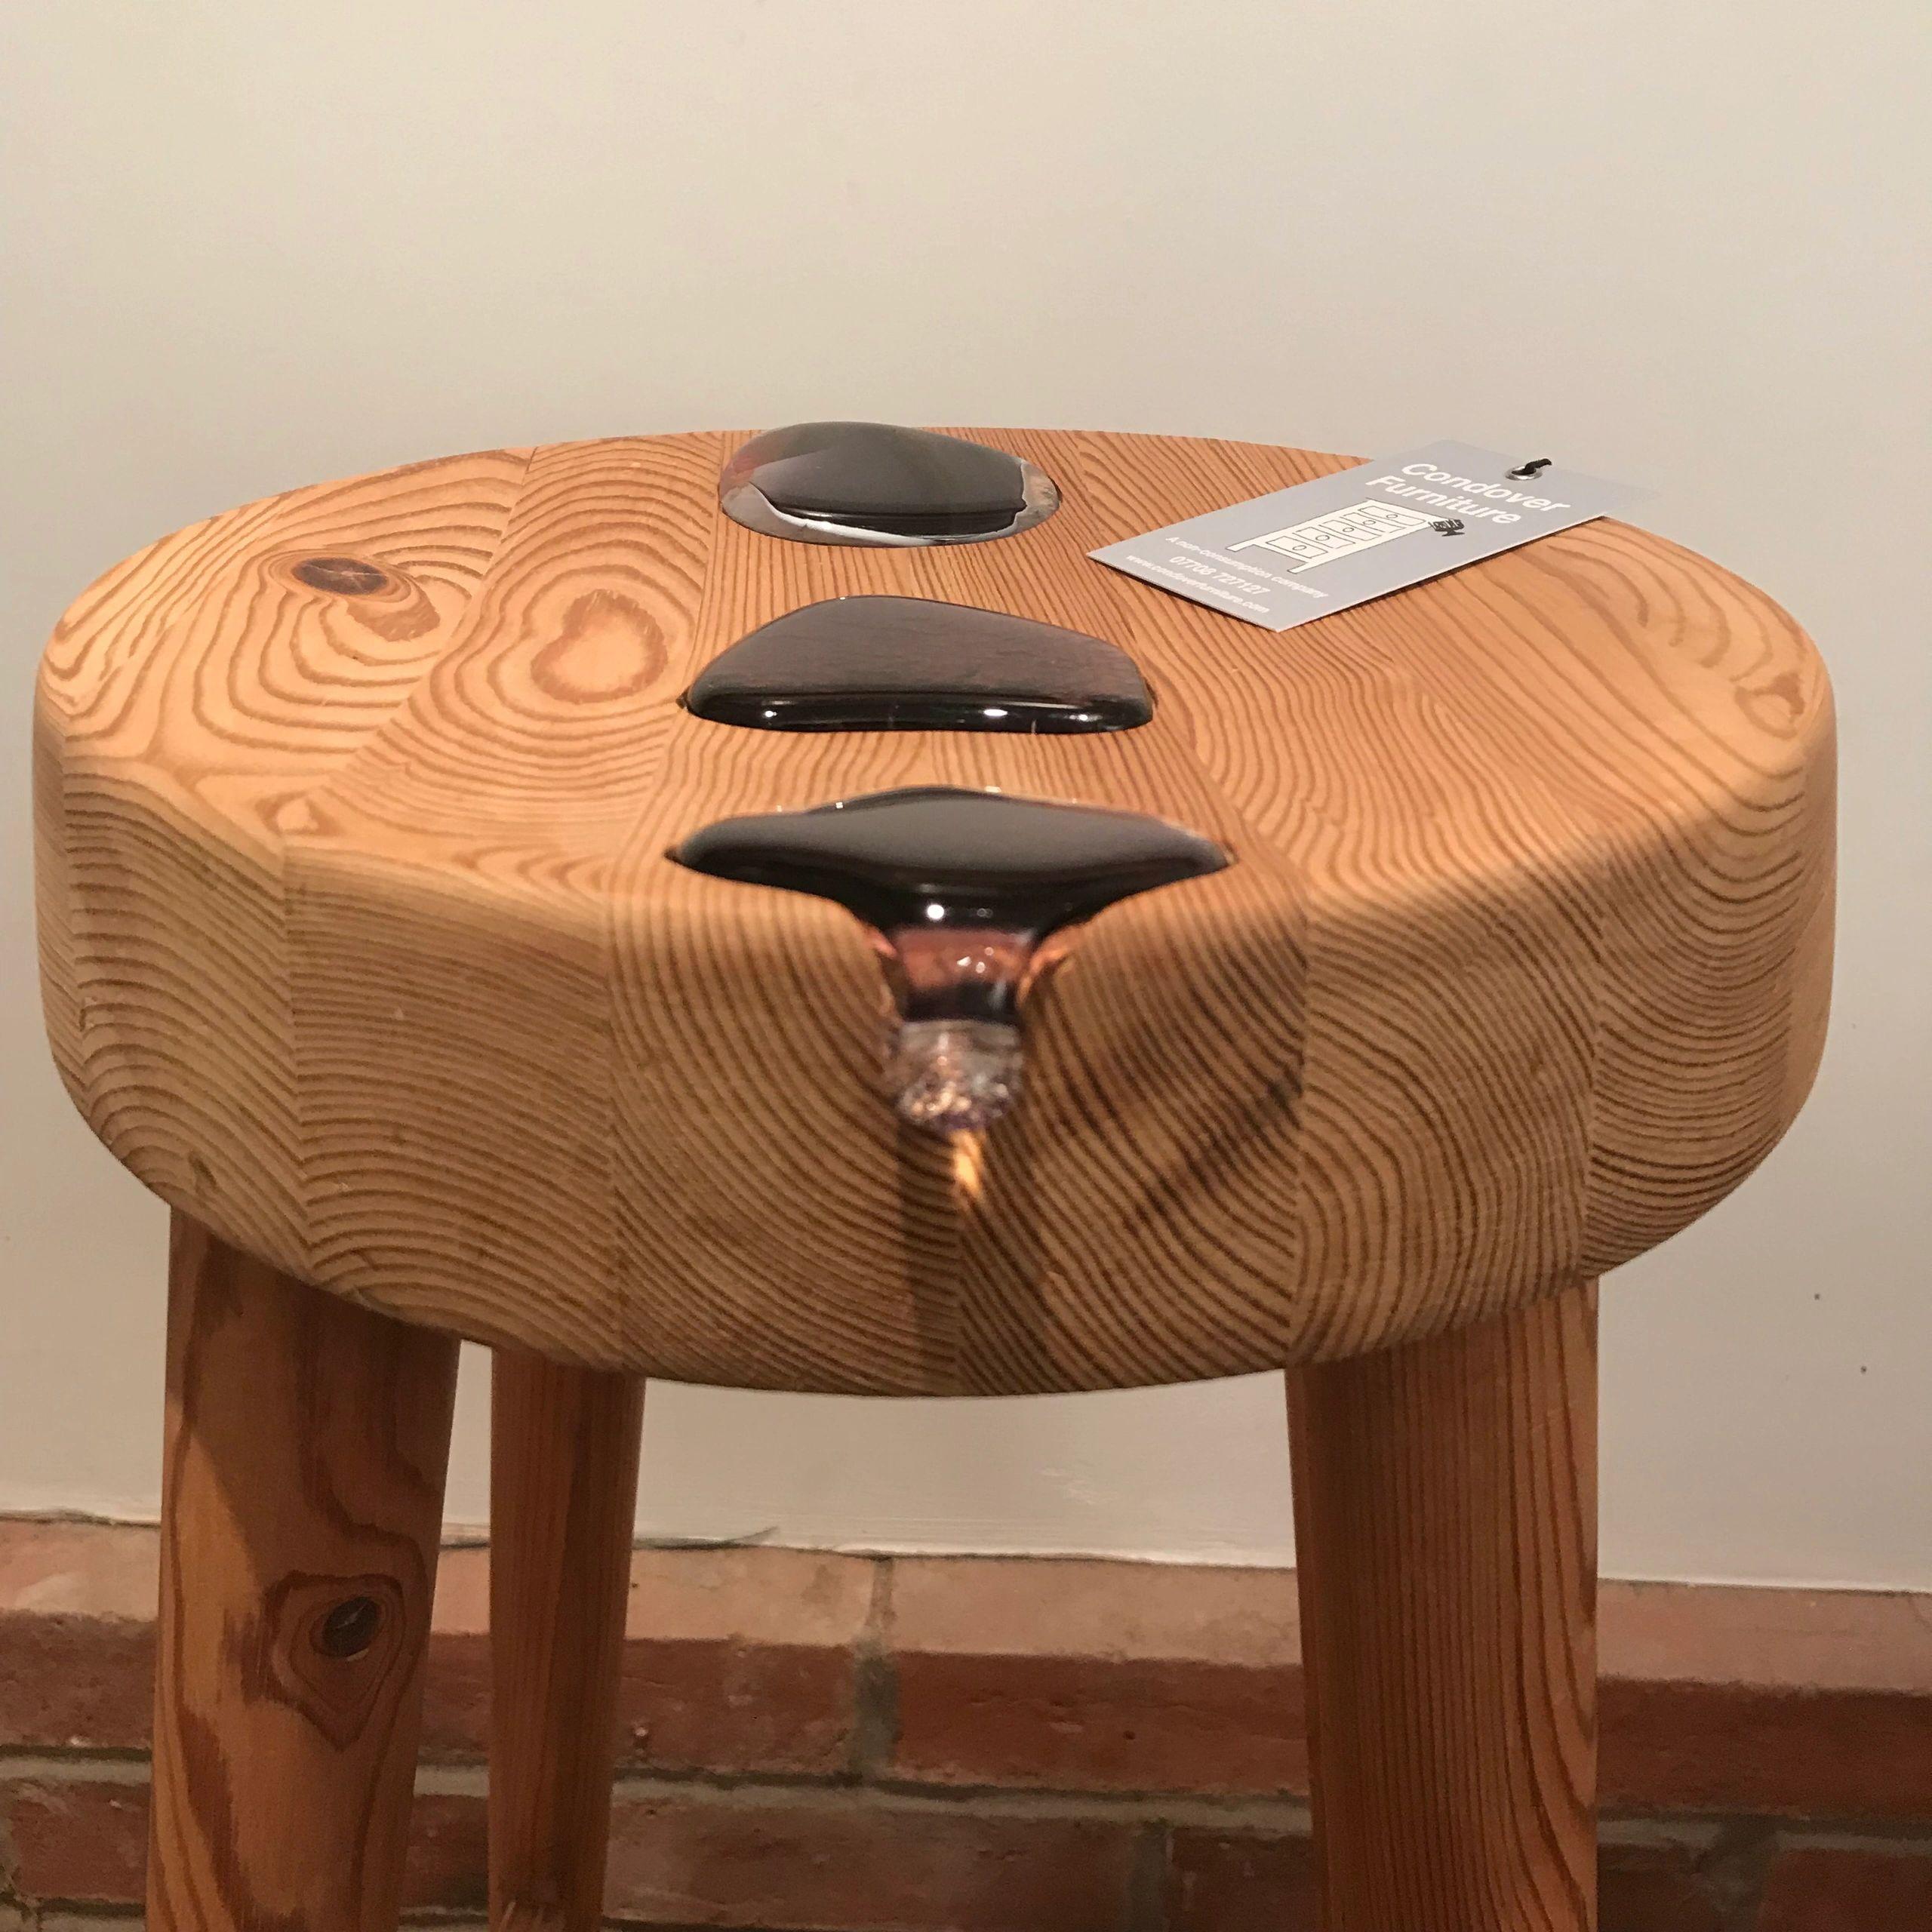 Tremendous Condover Furniture Theyellowbook Wood Chair Design Ideas Theyellowbookinfo